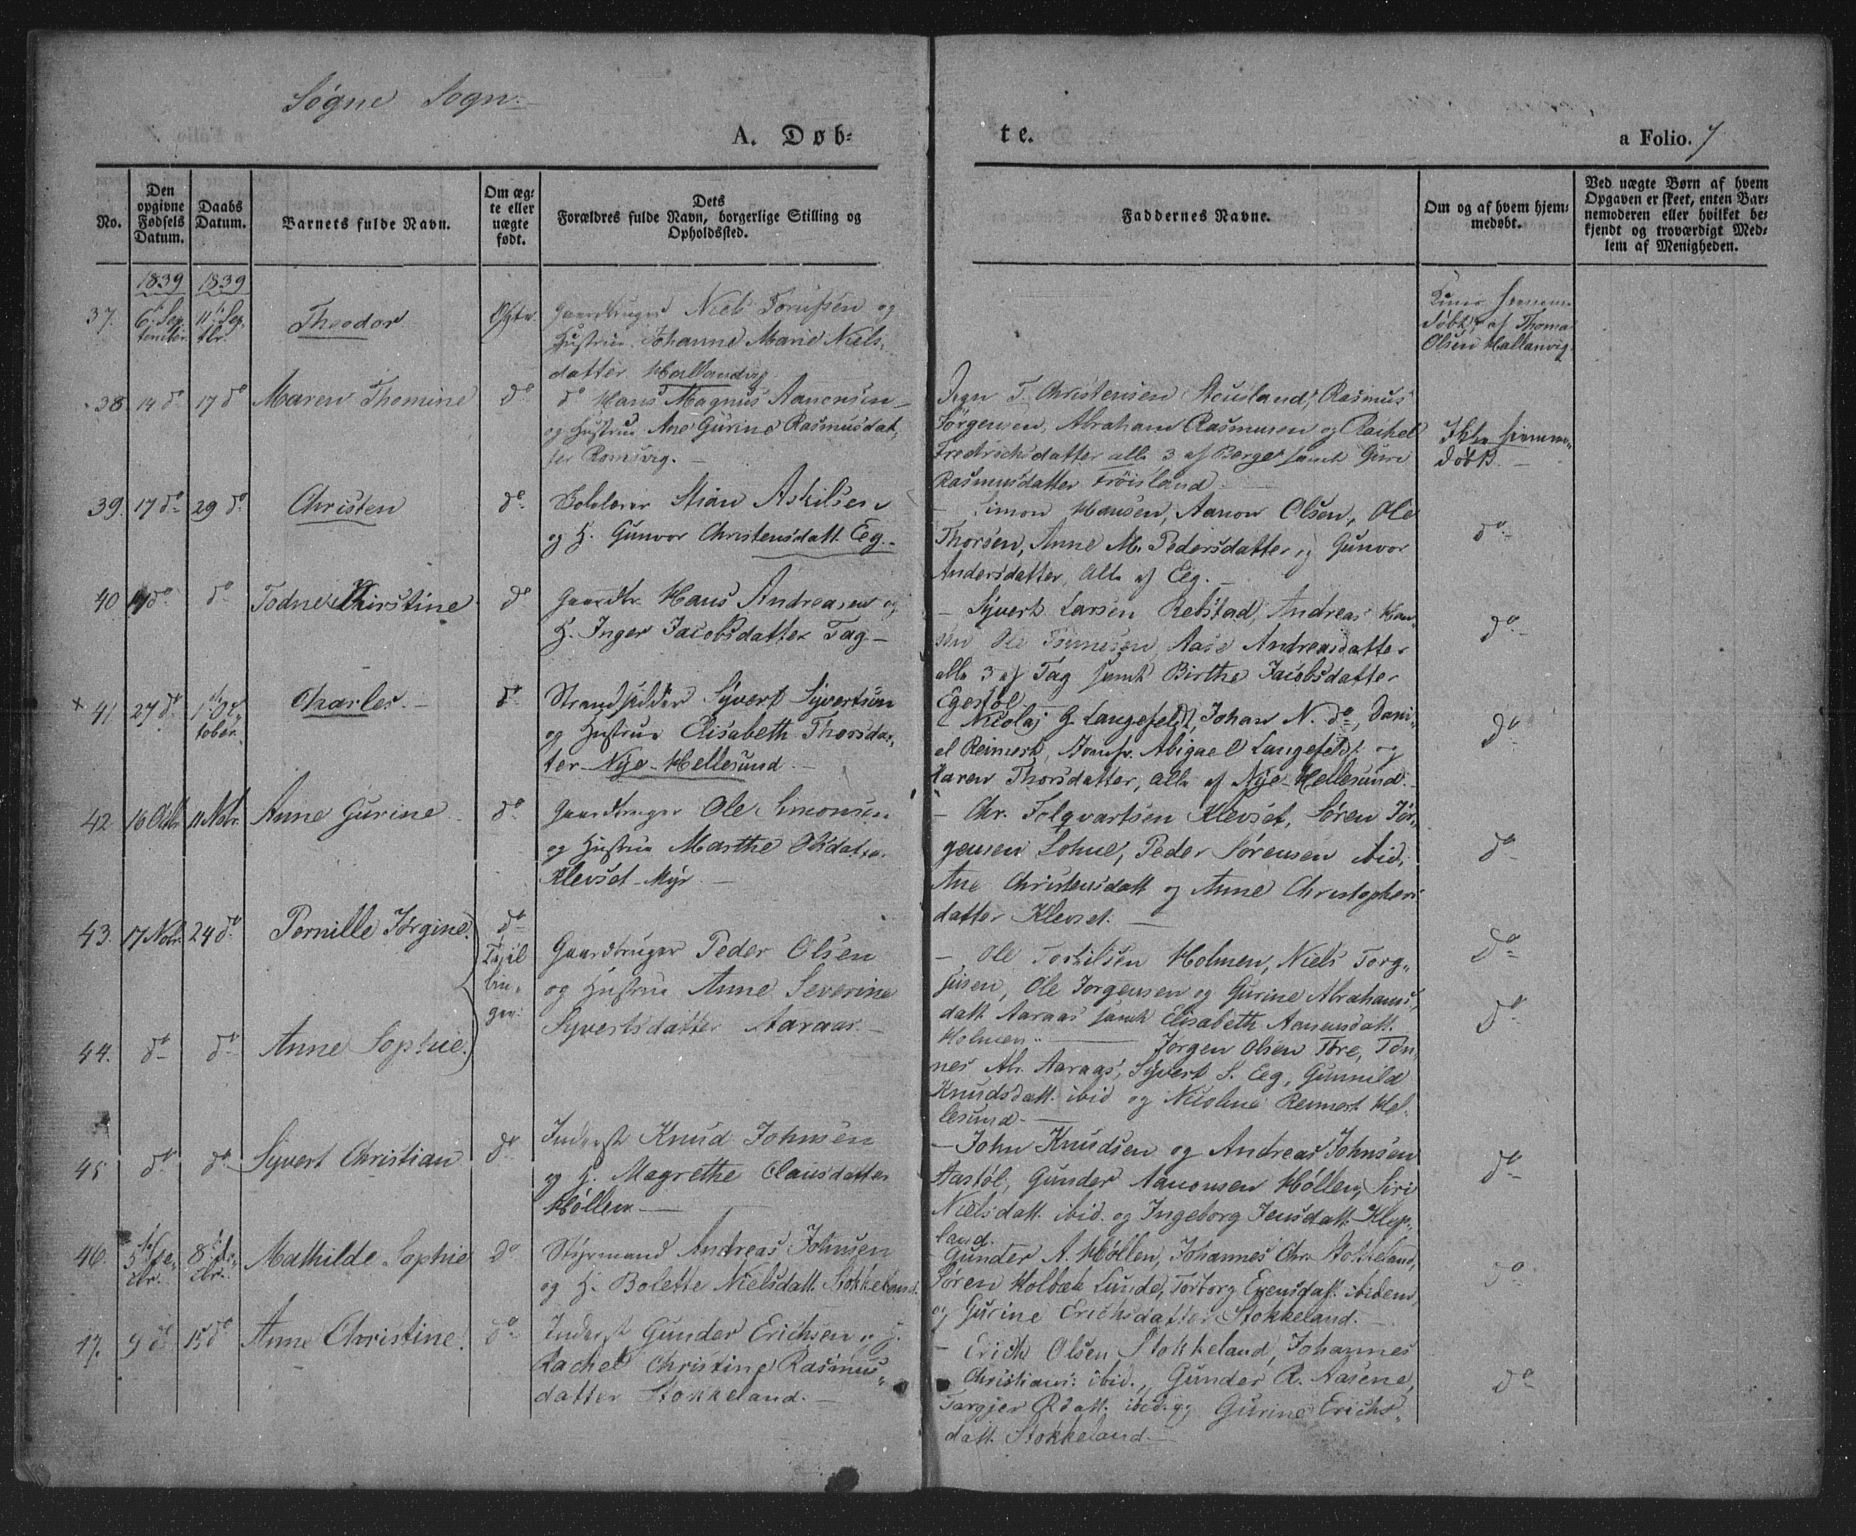 SAK, Søgne sokneprestkontor, F/Fa/Fab/L0009: Ministerialbok nr. A 9, 1838-1853, s. 7